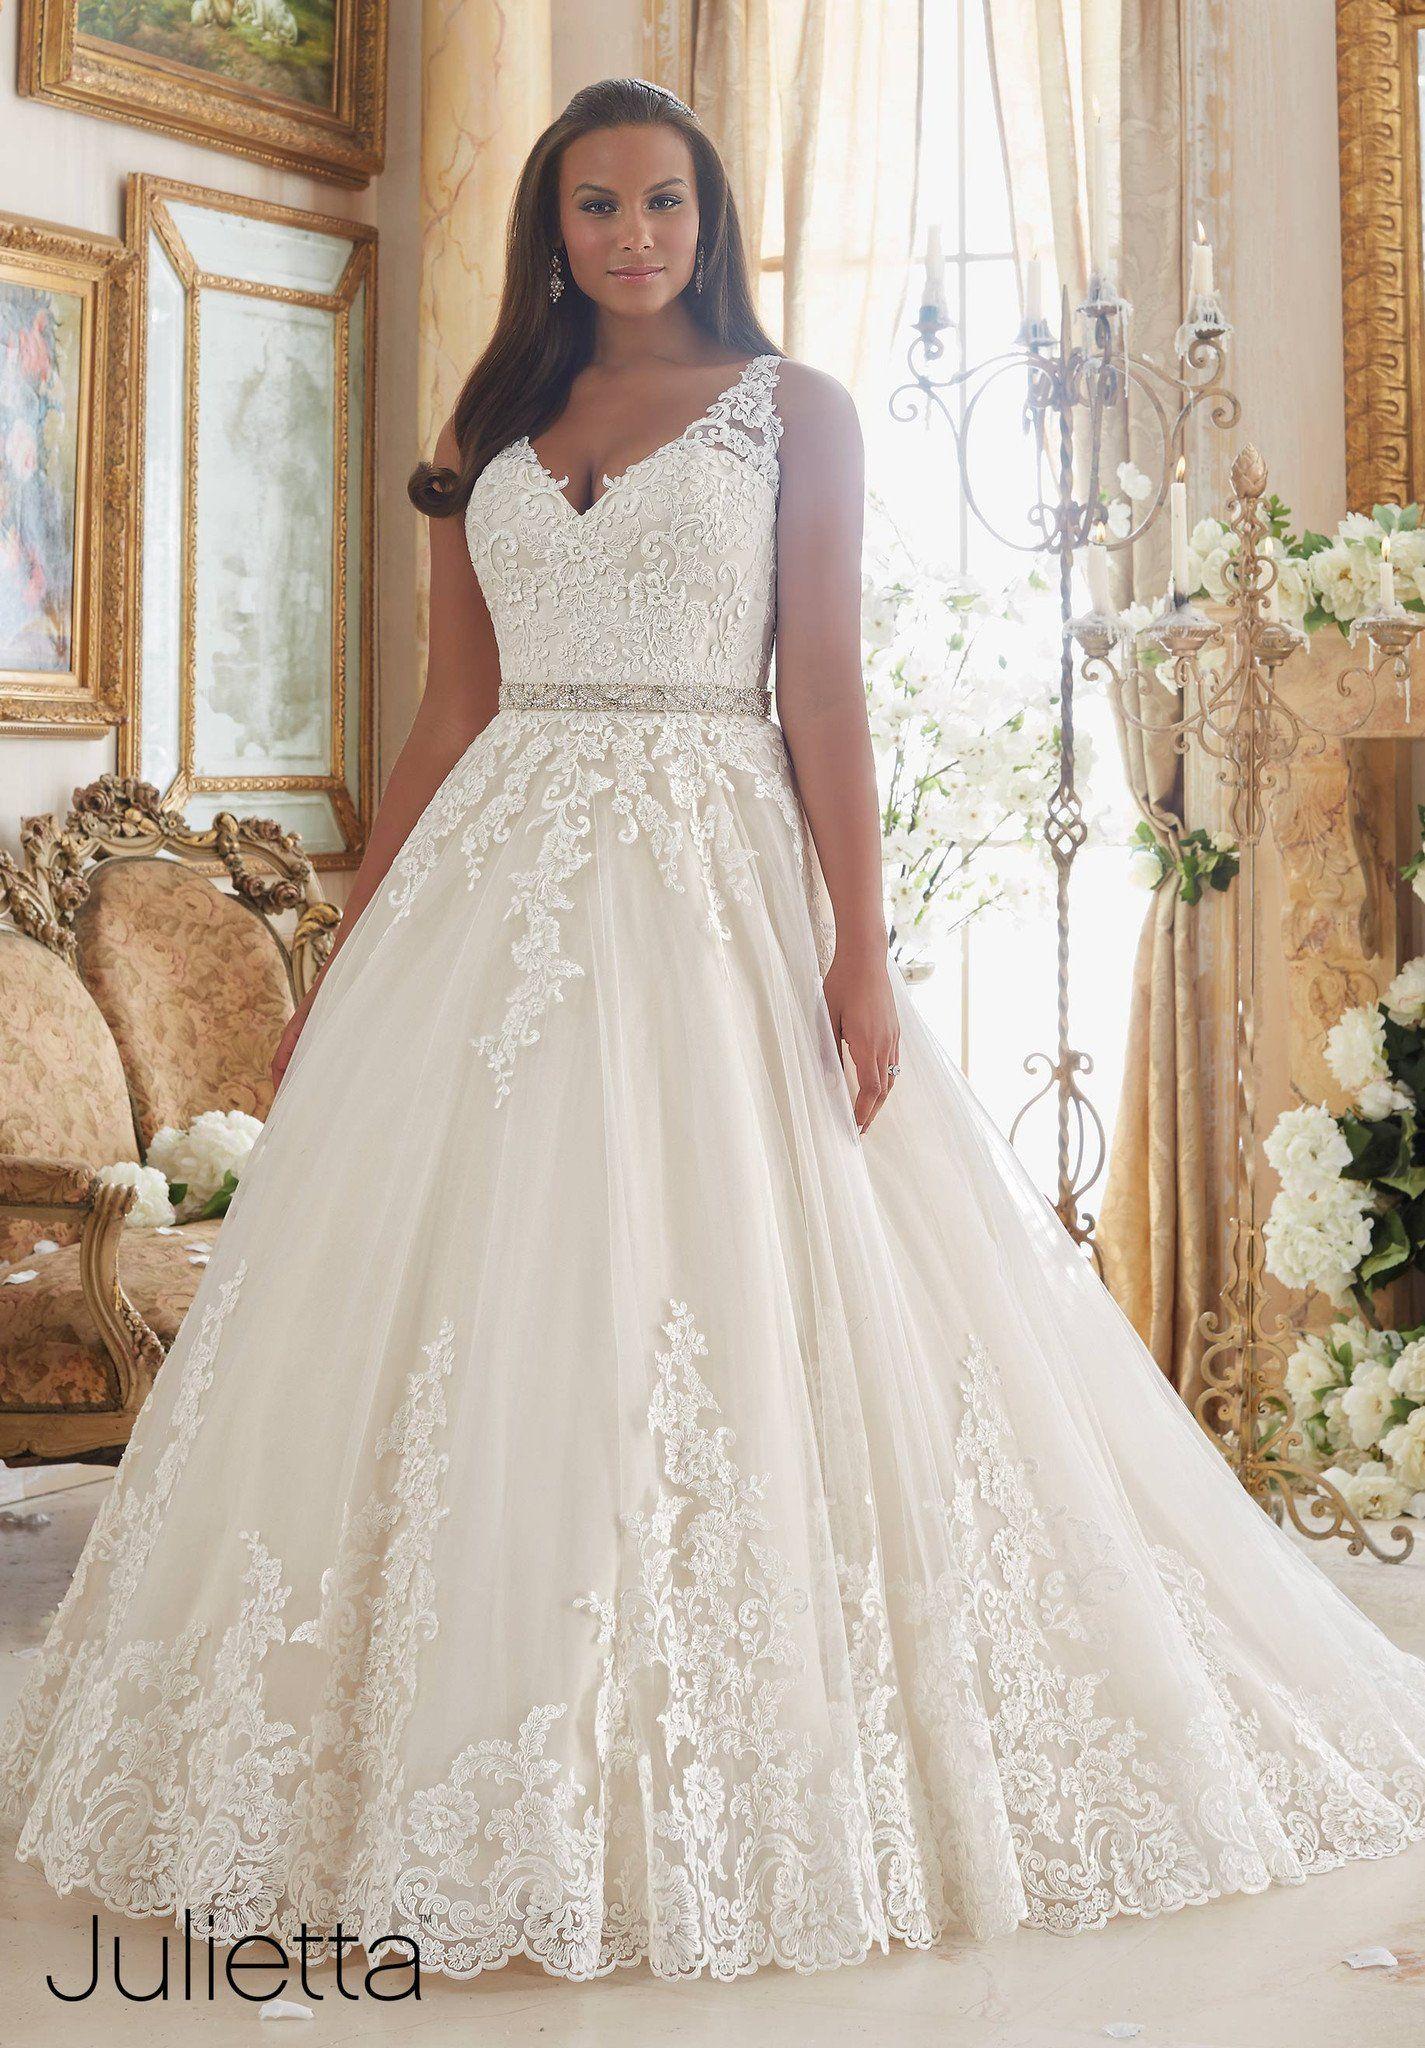 Julietta - 3208 - All Dressed Up, Bridal Gown | Tuxedo rental ...